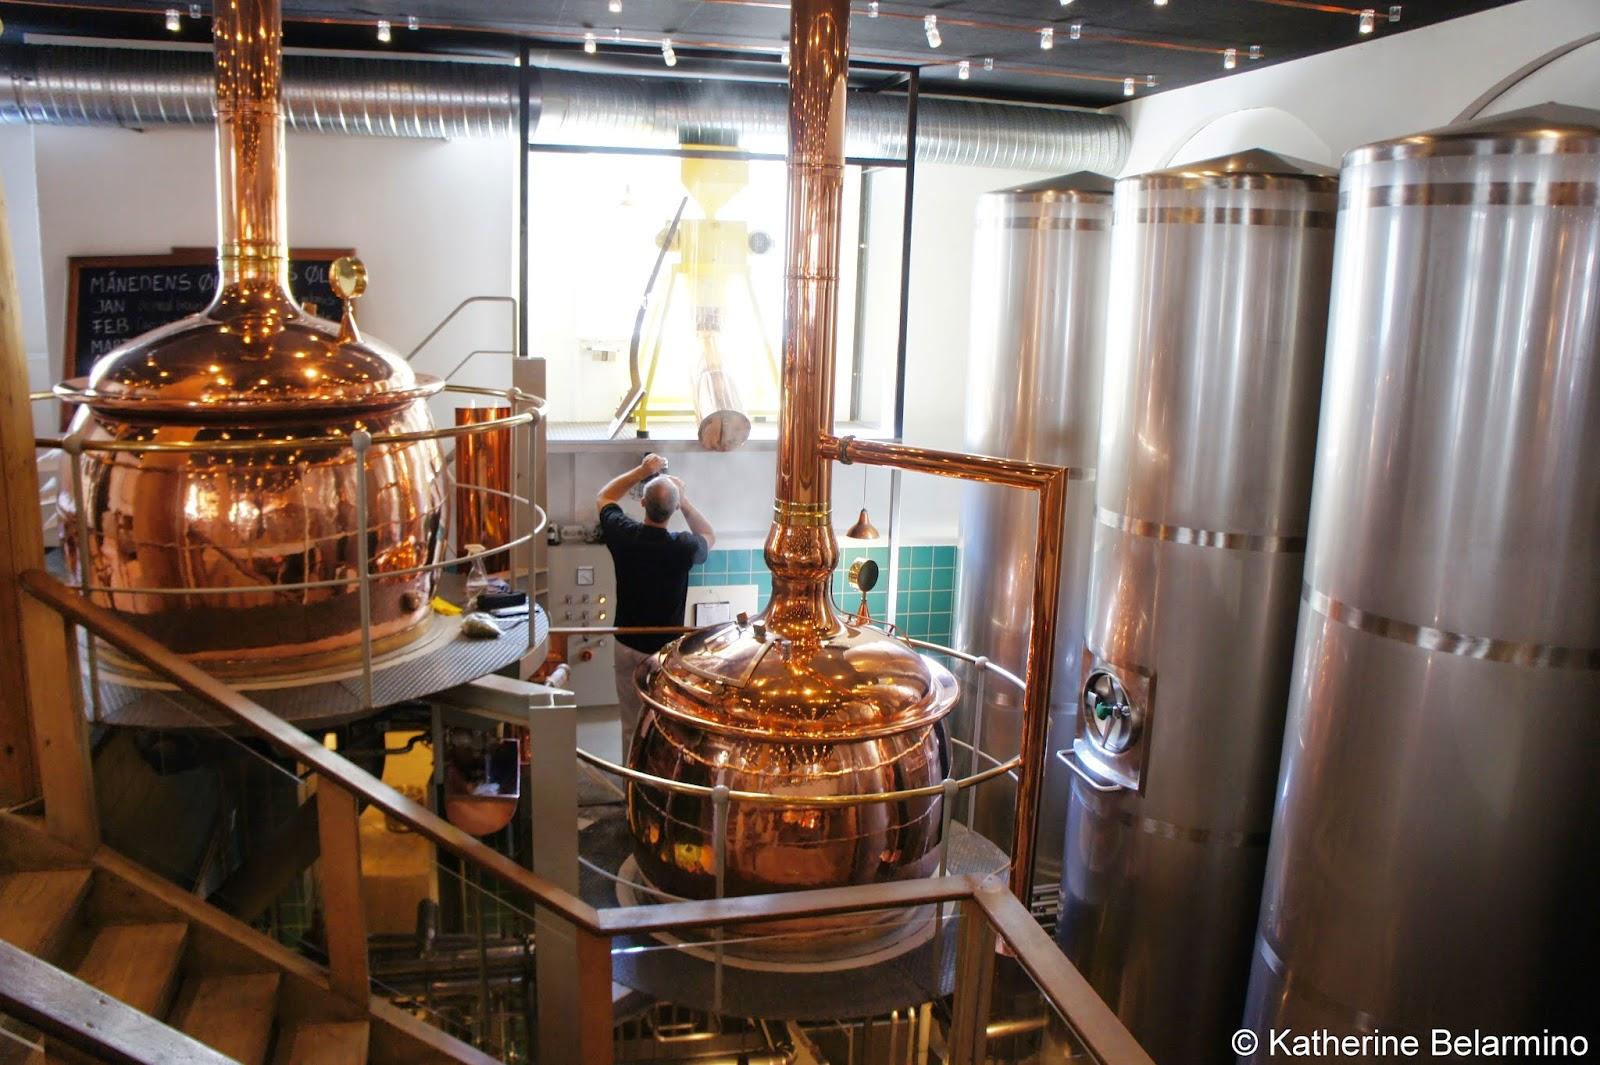 Sct. Clemens Brewery Aarhus Denmark